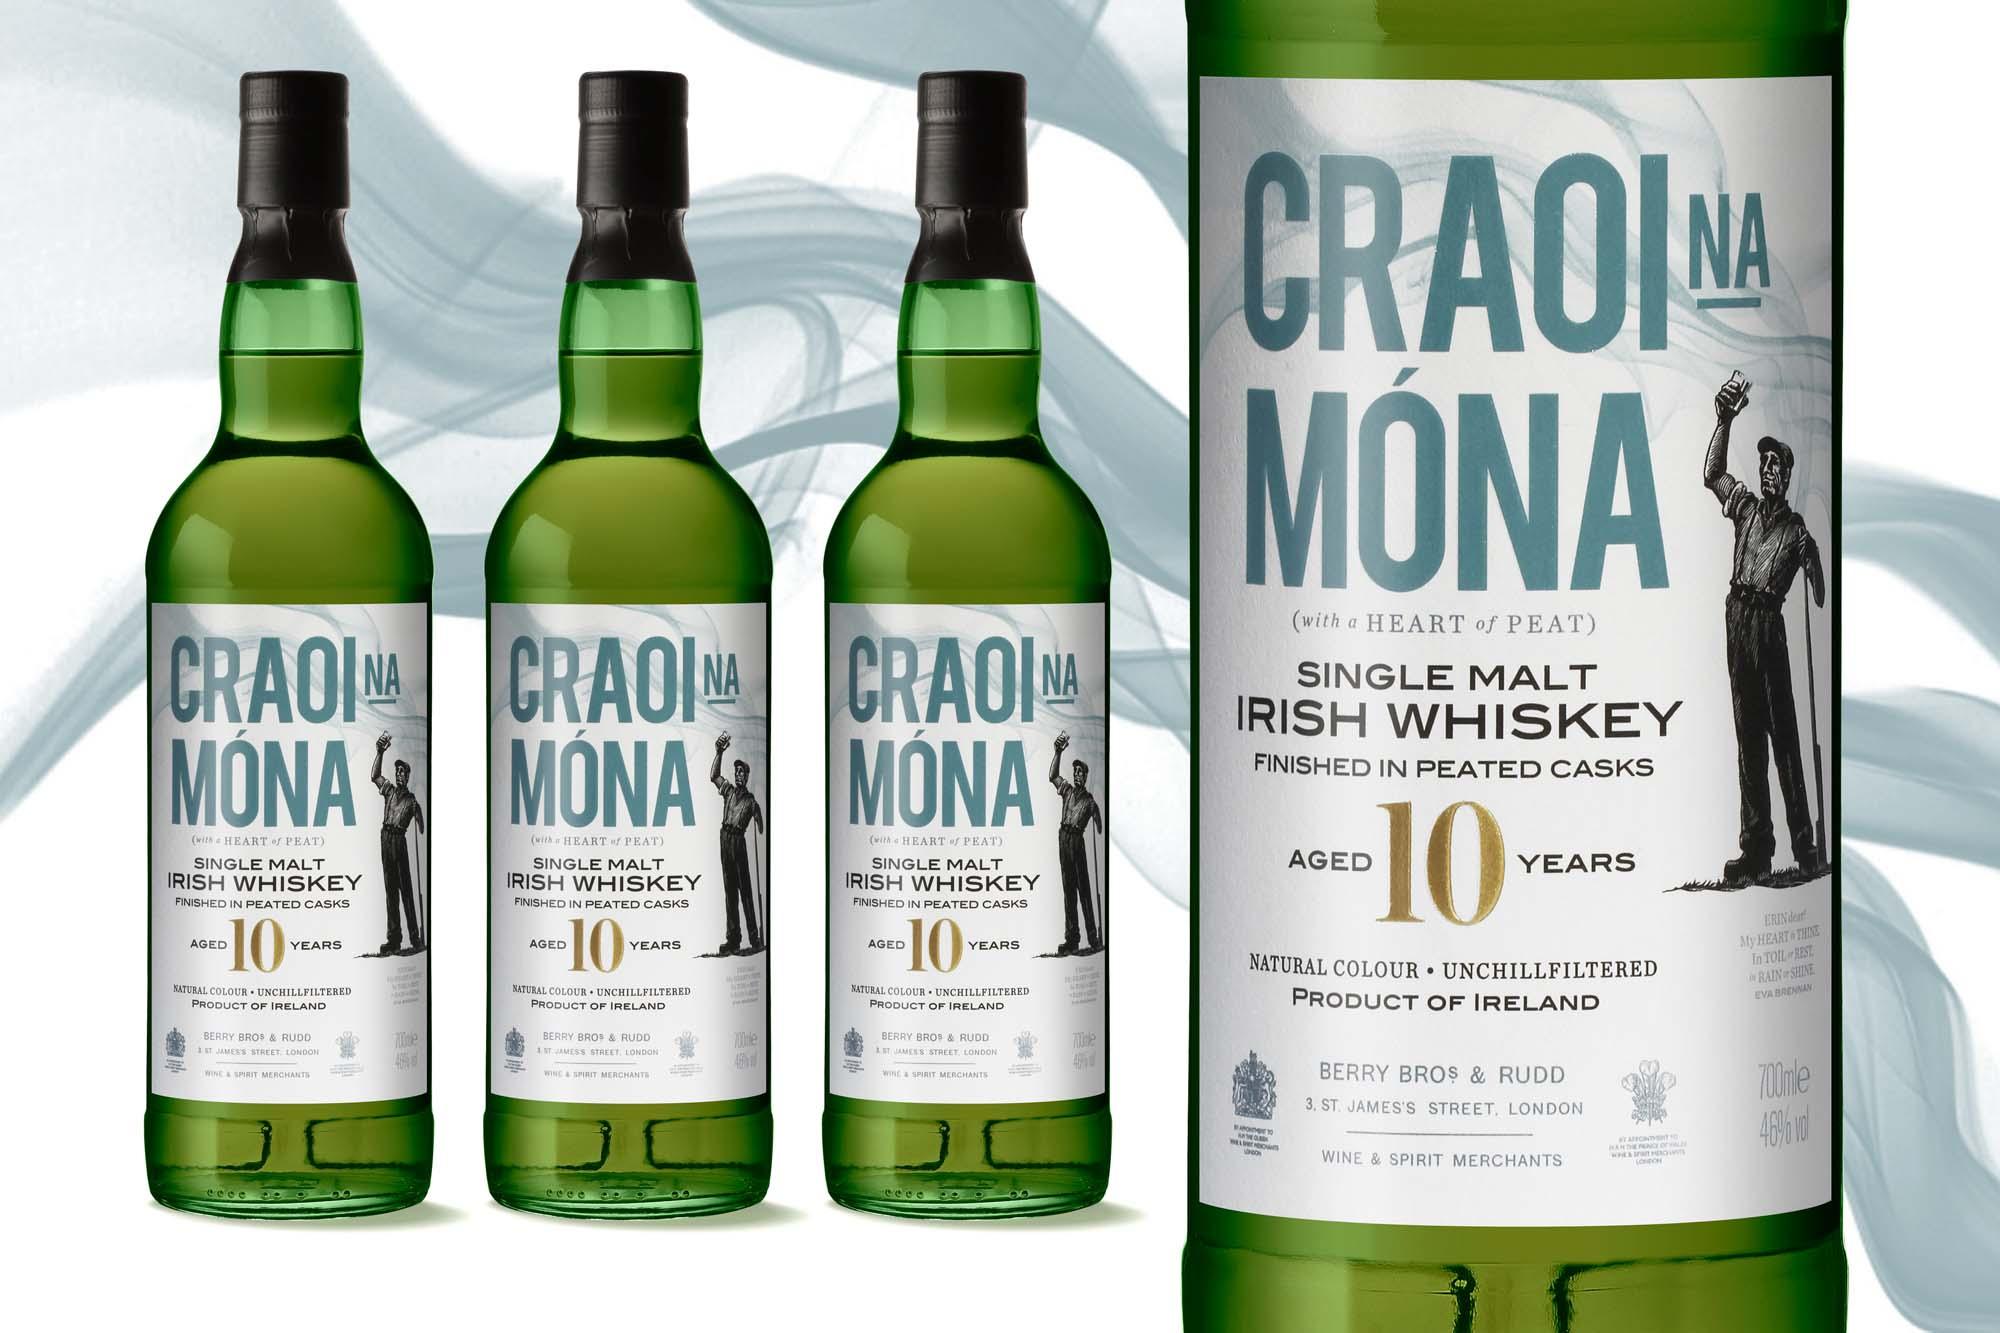 02_Craoi_na_Mona_bottles_02_HR